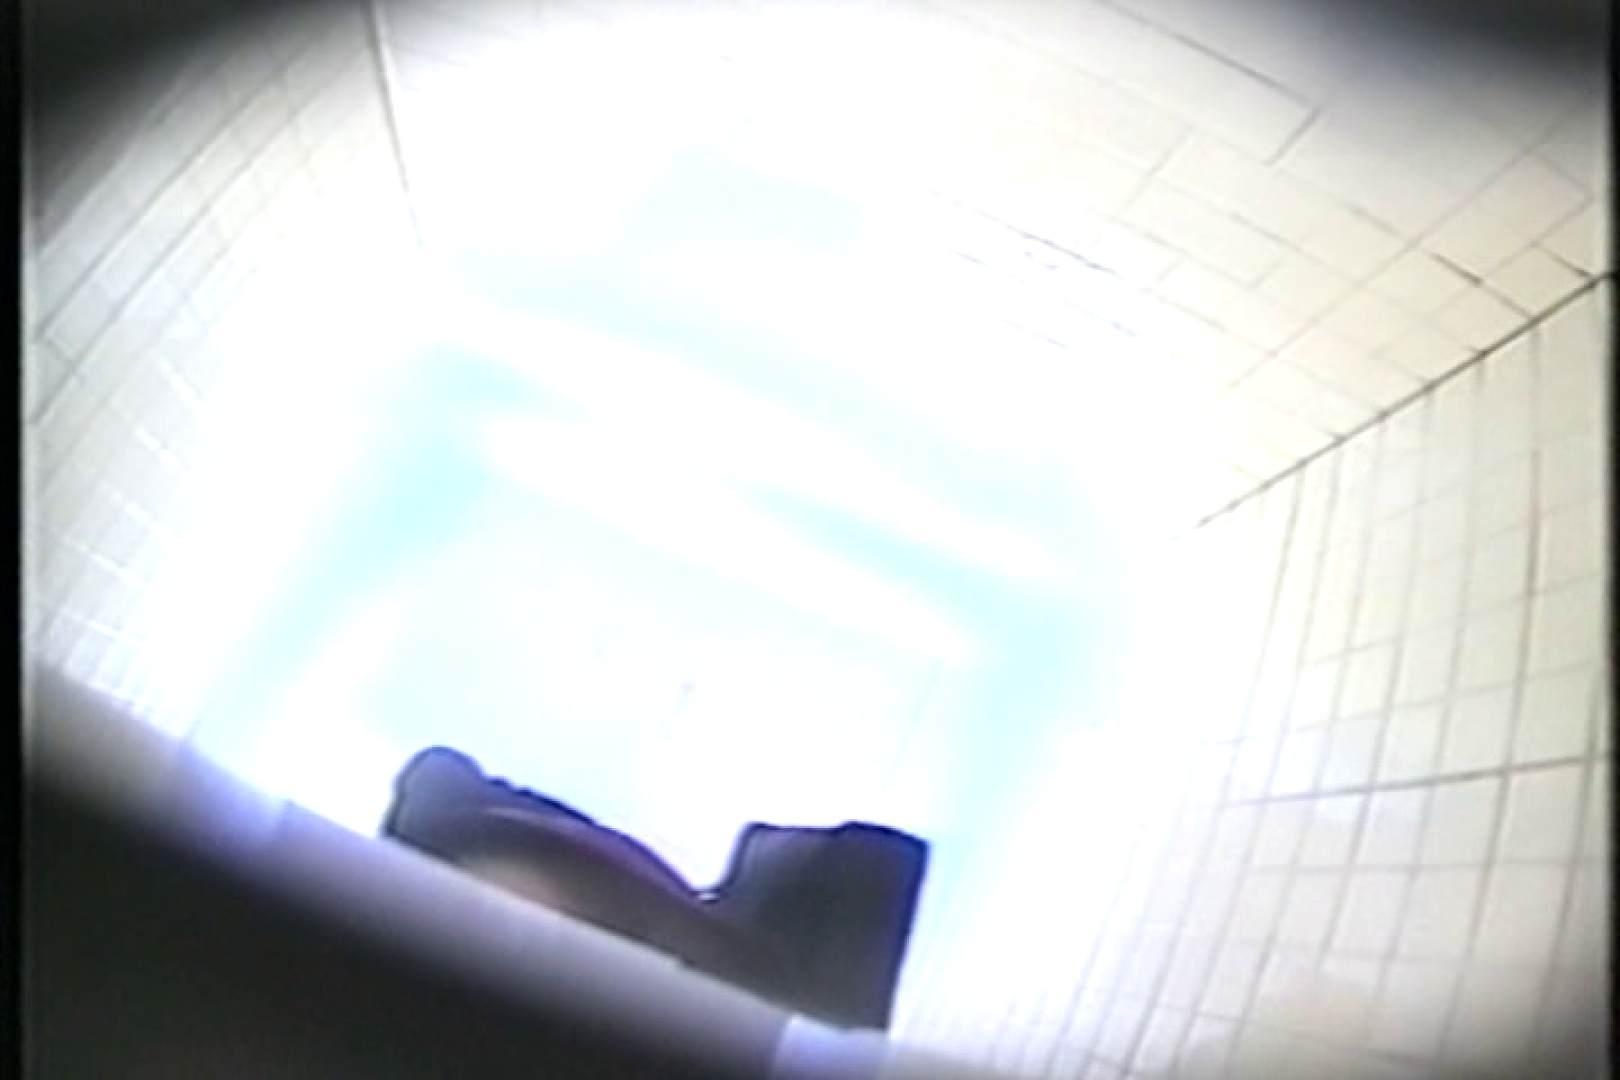 下半身シースルー洗面所Vol.3 0 | 0  20画像 16